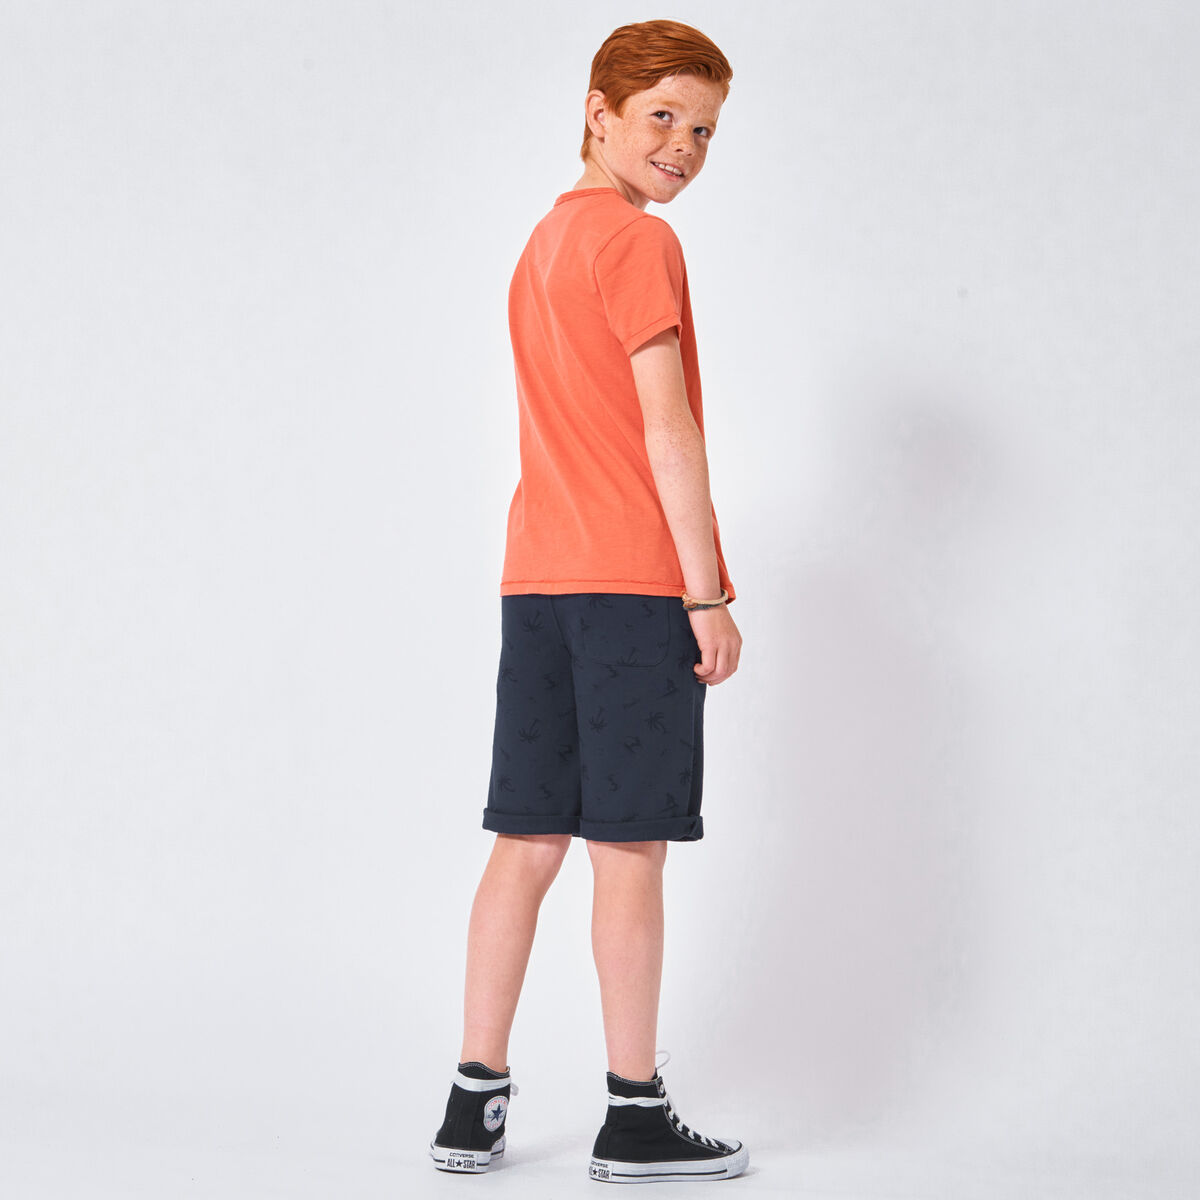 Sweat short Nico Jr.